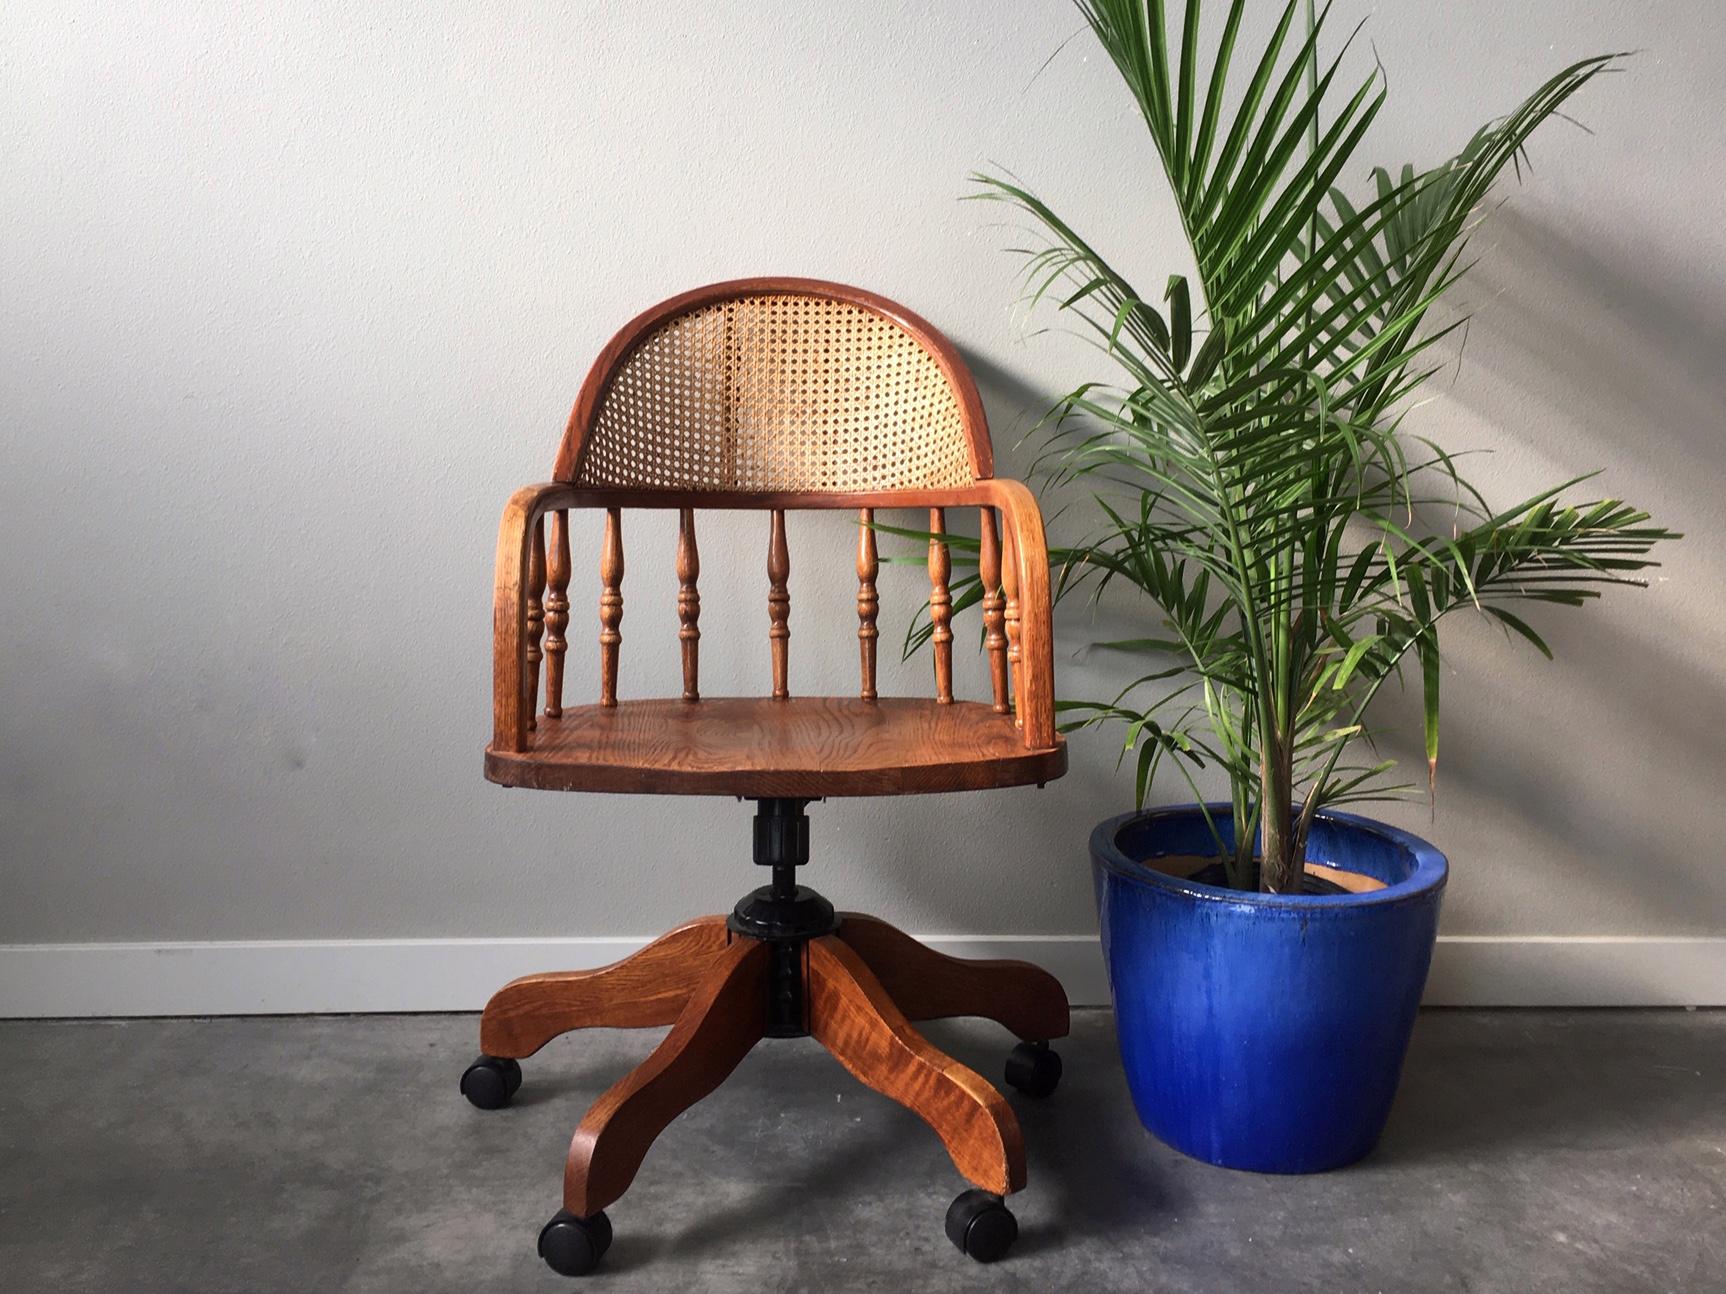 Astonishing Vintage Cane Desk Chair Rerunroom Vintage Furniture Home Decor Creativecarmelina Interior Chair Design Creativecarmelinacom